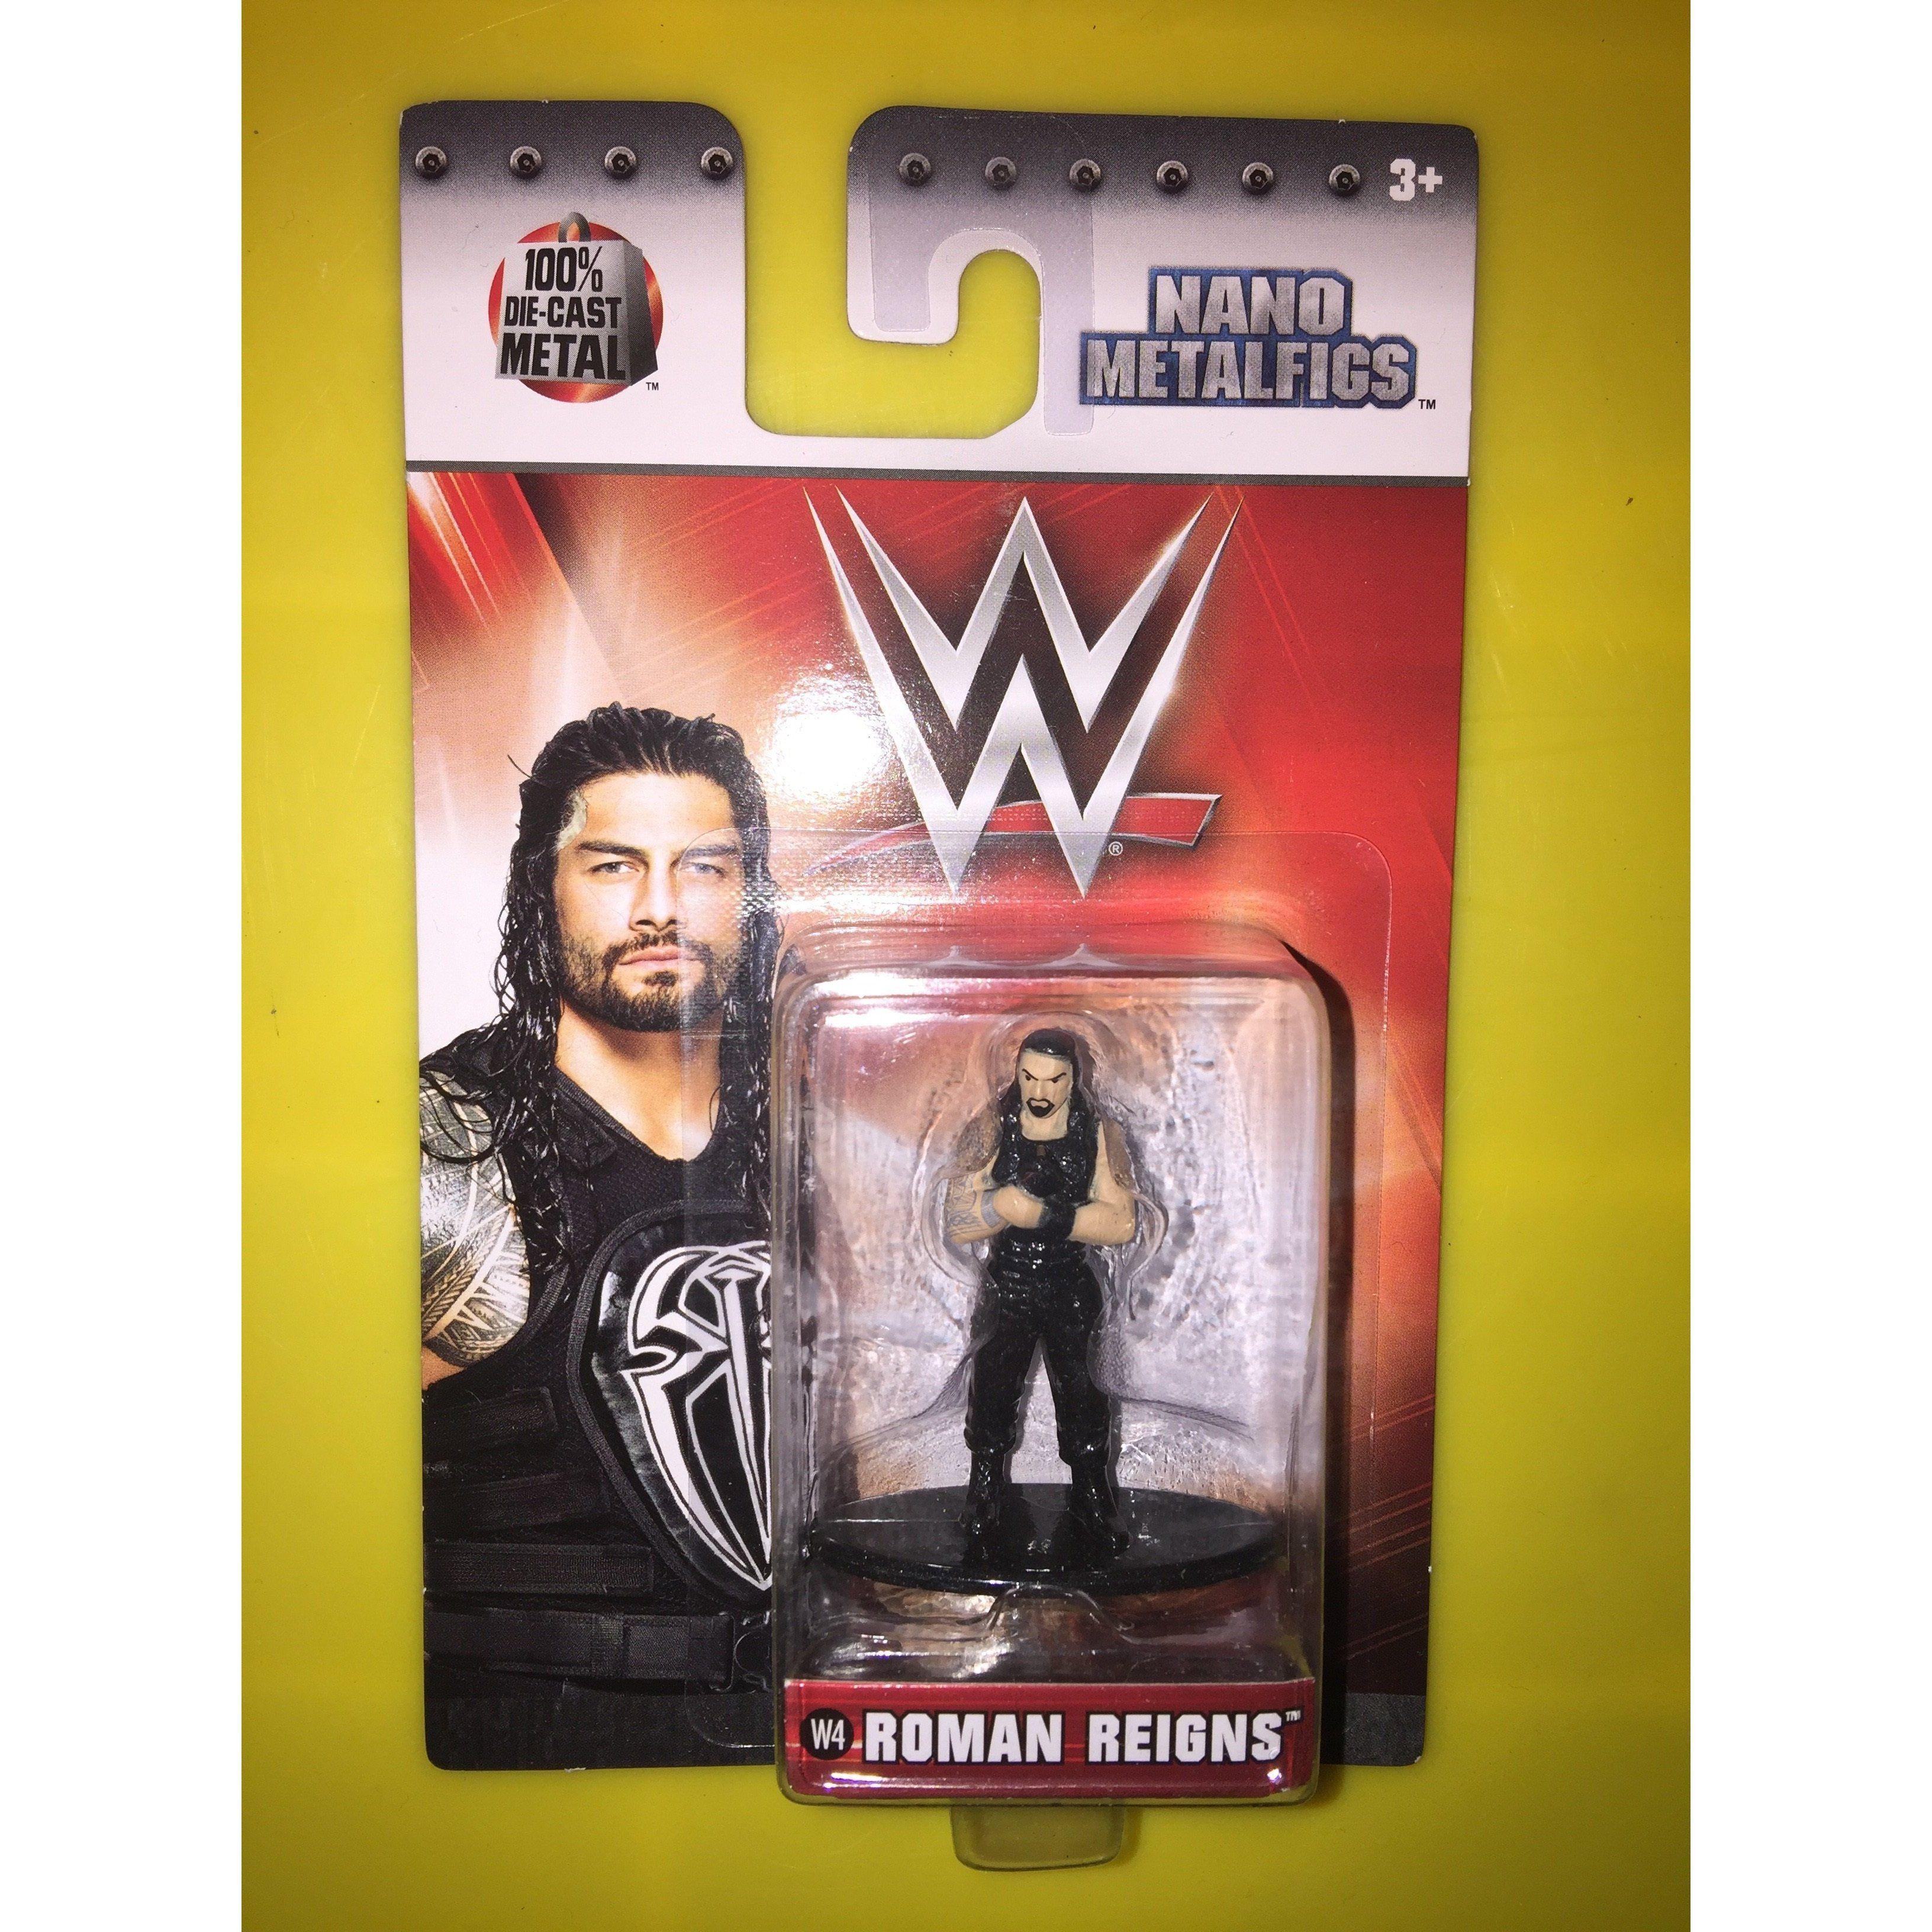 WWE Nano Metalfigs Roman Reigns figure